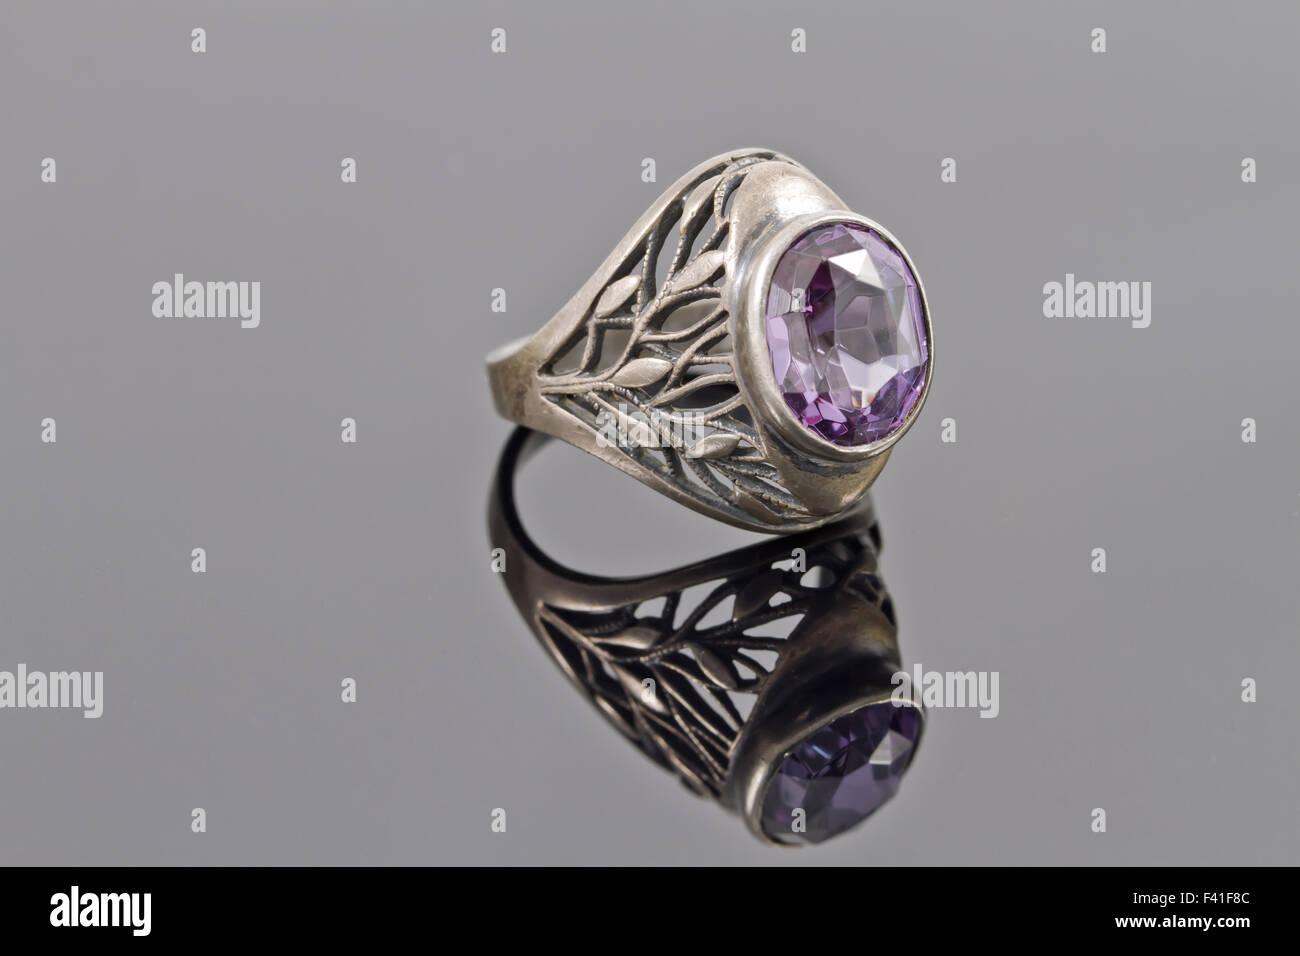 dc8c4d42e782 Anillo de plata vieja Foto   Imagen De Stock  88544412 - Alamy